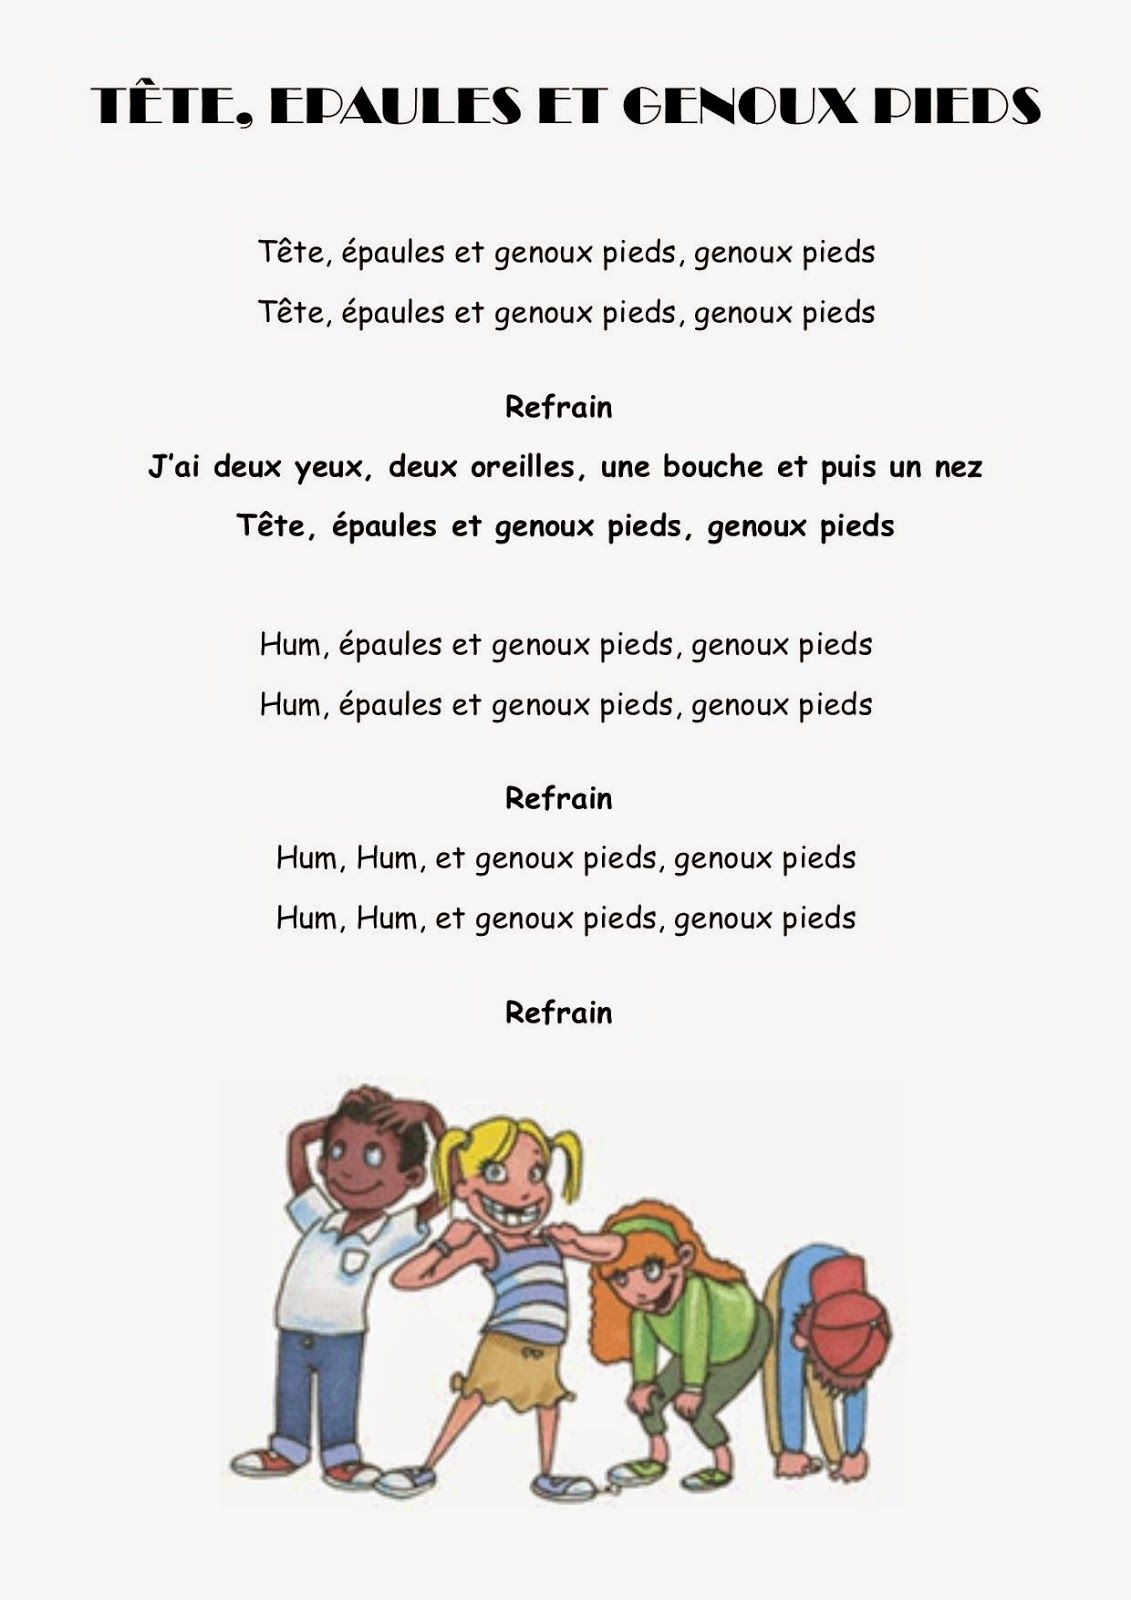 Ma Petite Maternelle | Comptines, Comptine Maternelle tout Comptines Et Chansons